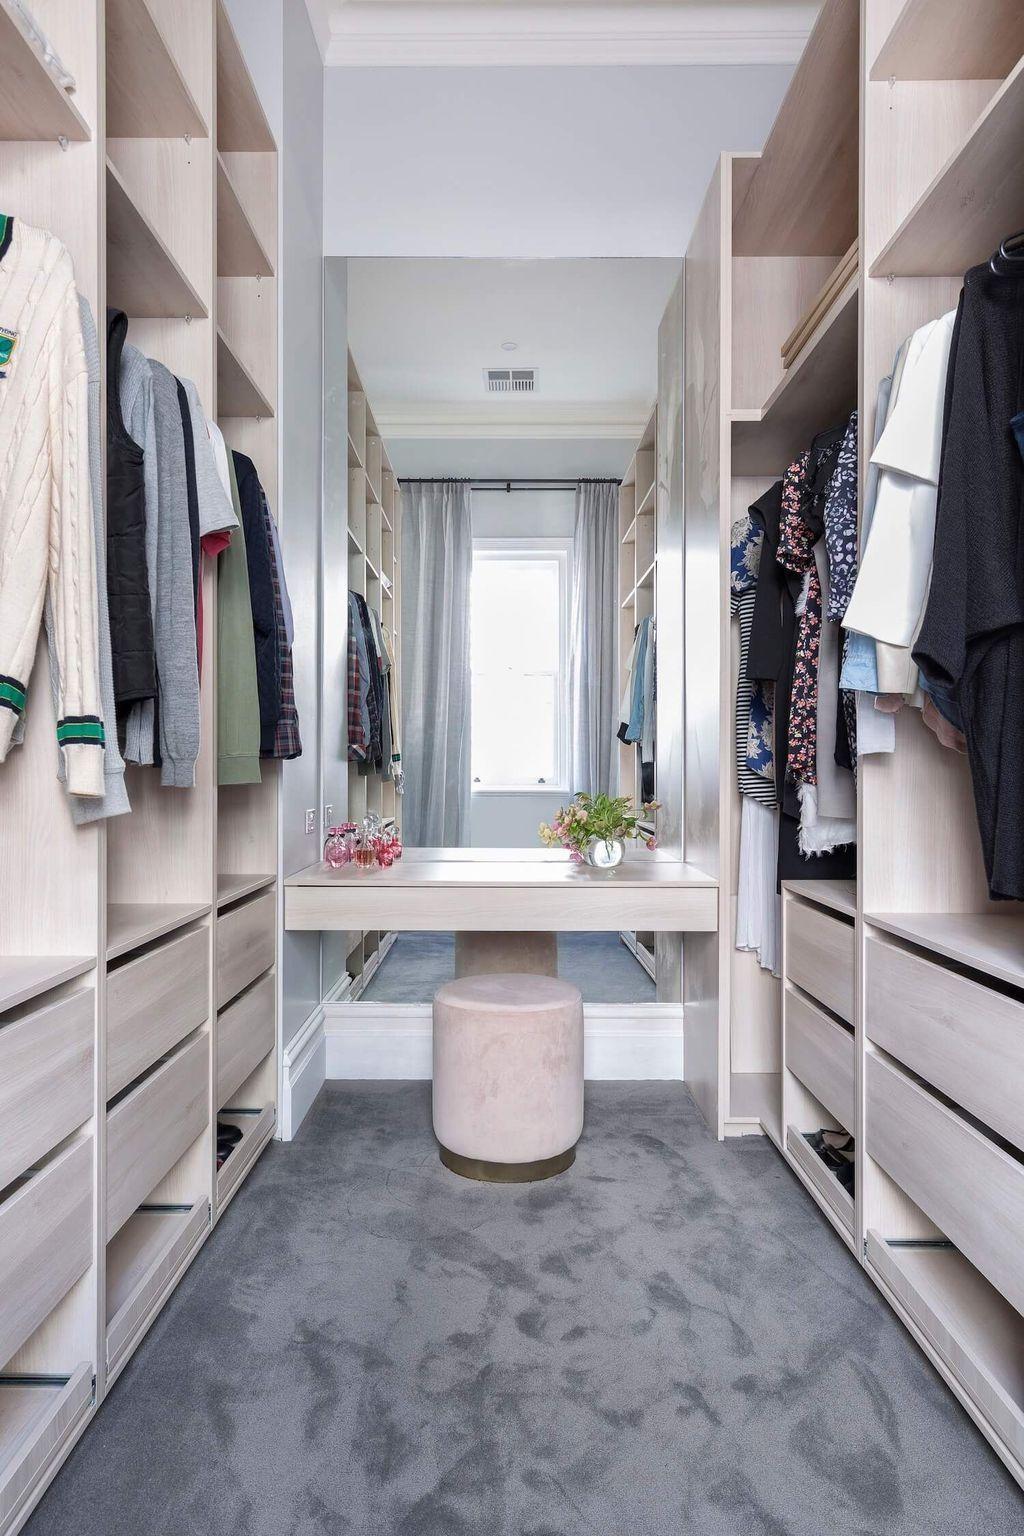 20+ Beautiful Concept Of A Wardrobe Ideas For Bedroom - Image 26 of 50 #bedroomorganizationideas